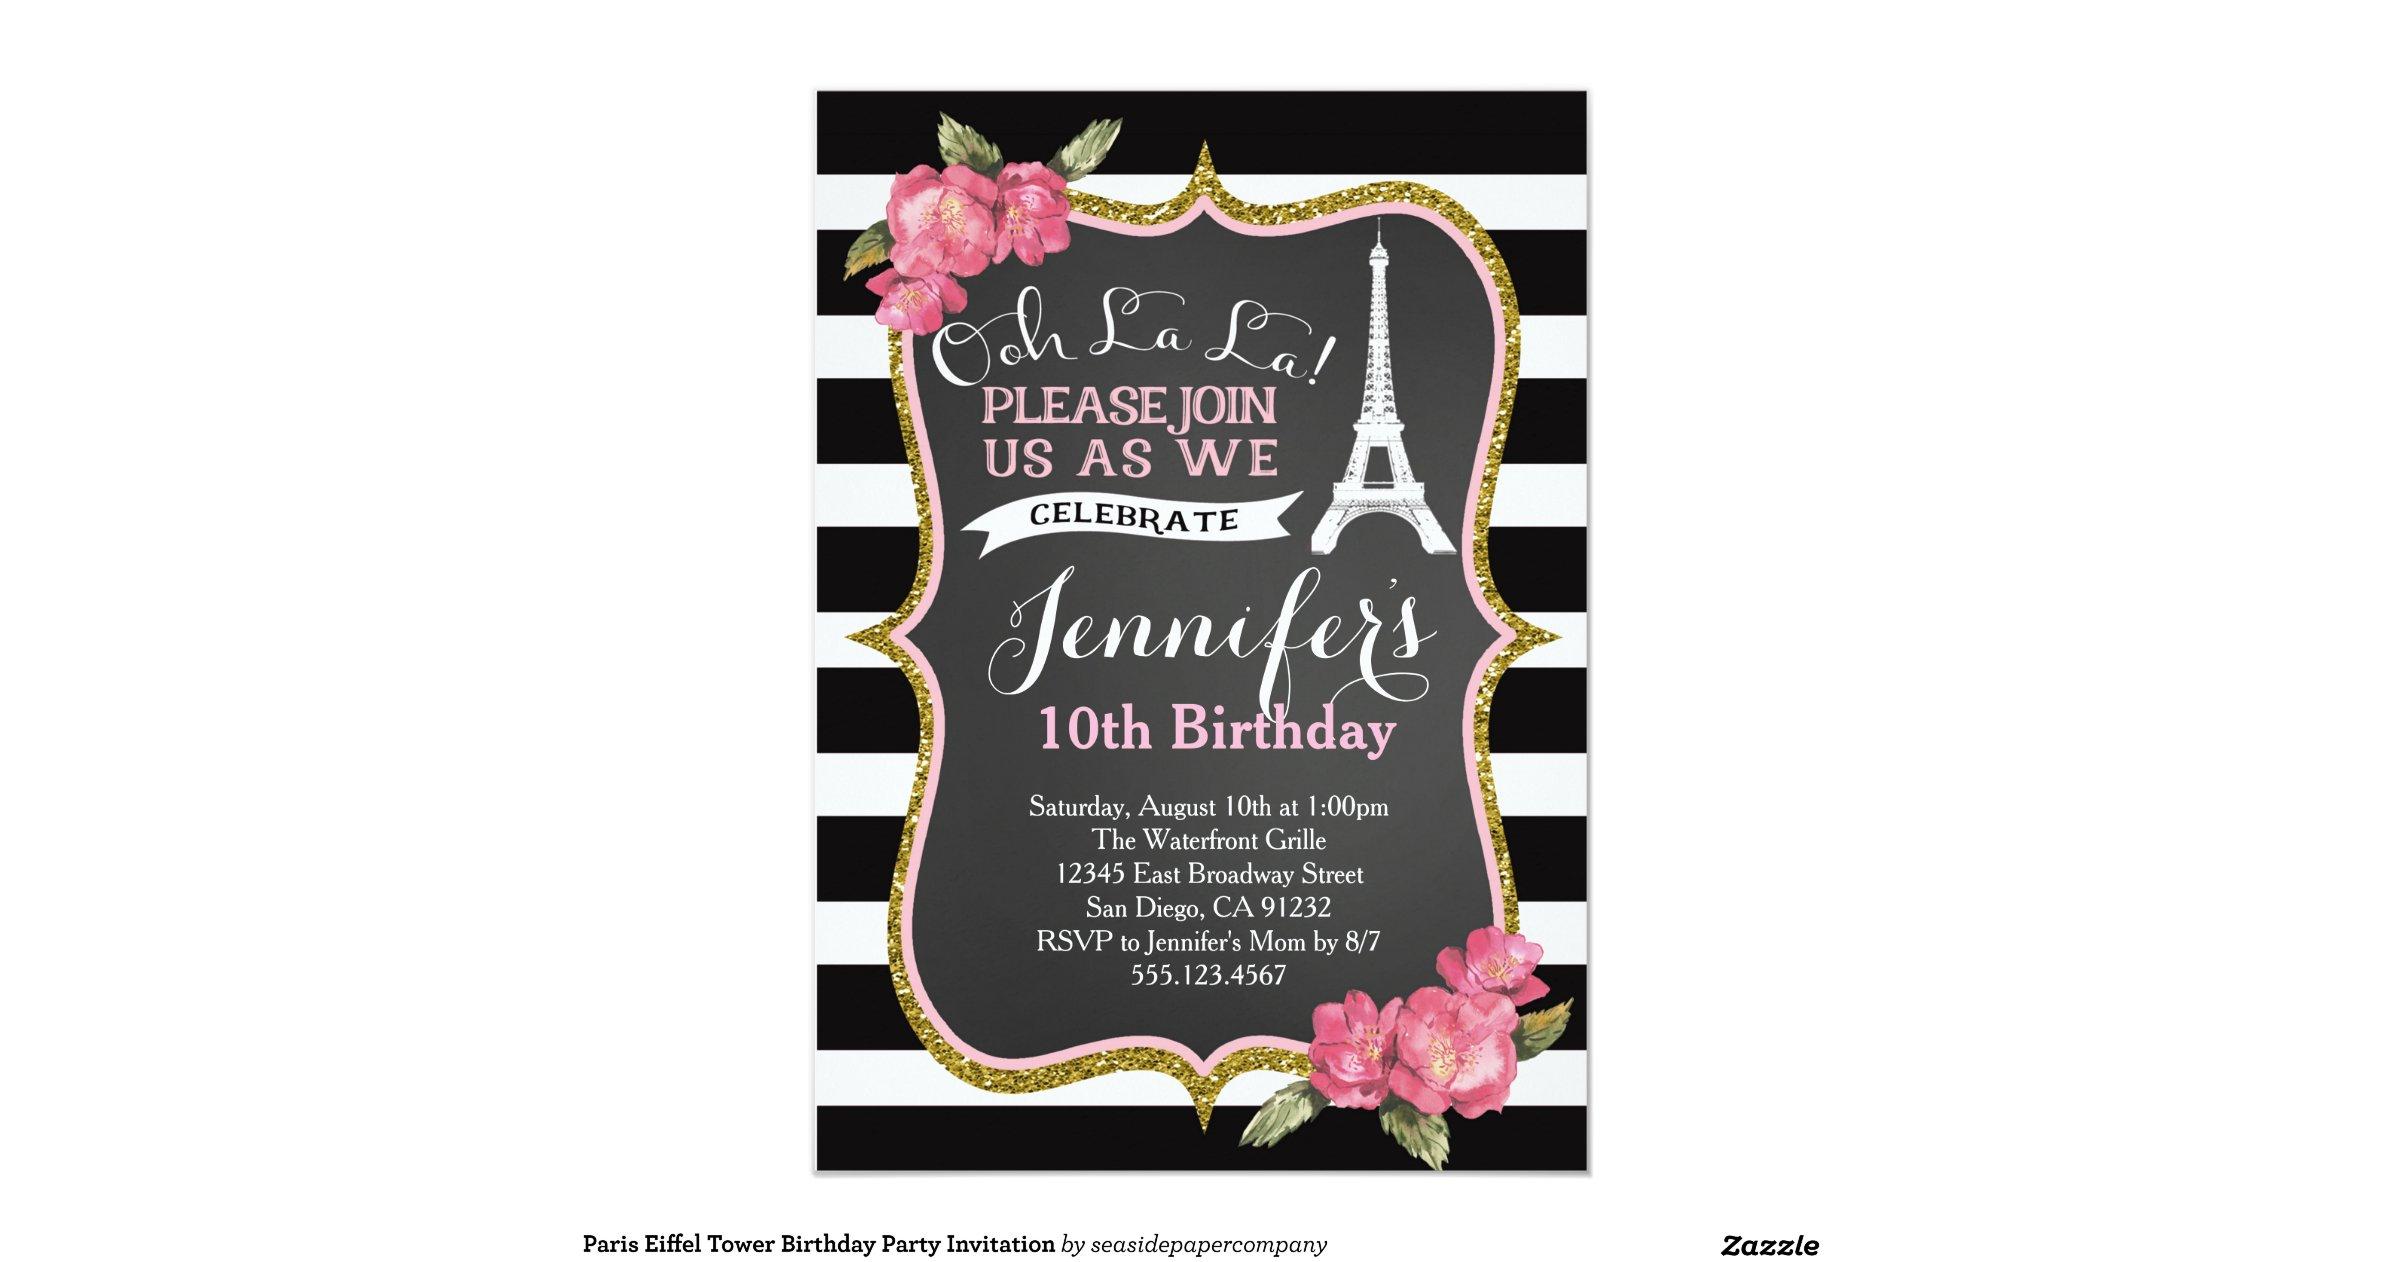 eiffel tower birthday invitations - 28 images - paris eiffel tower ...